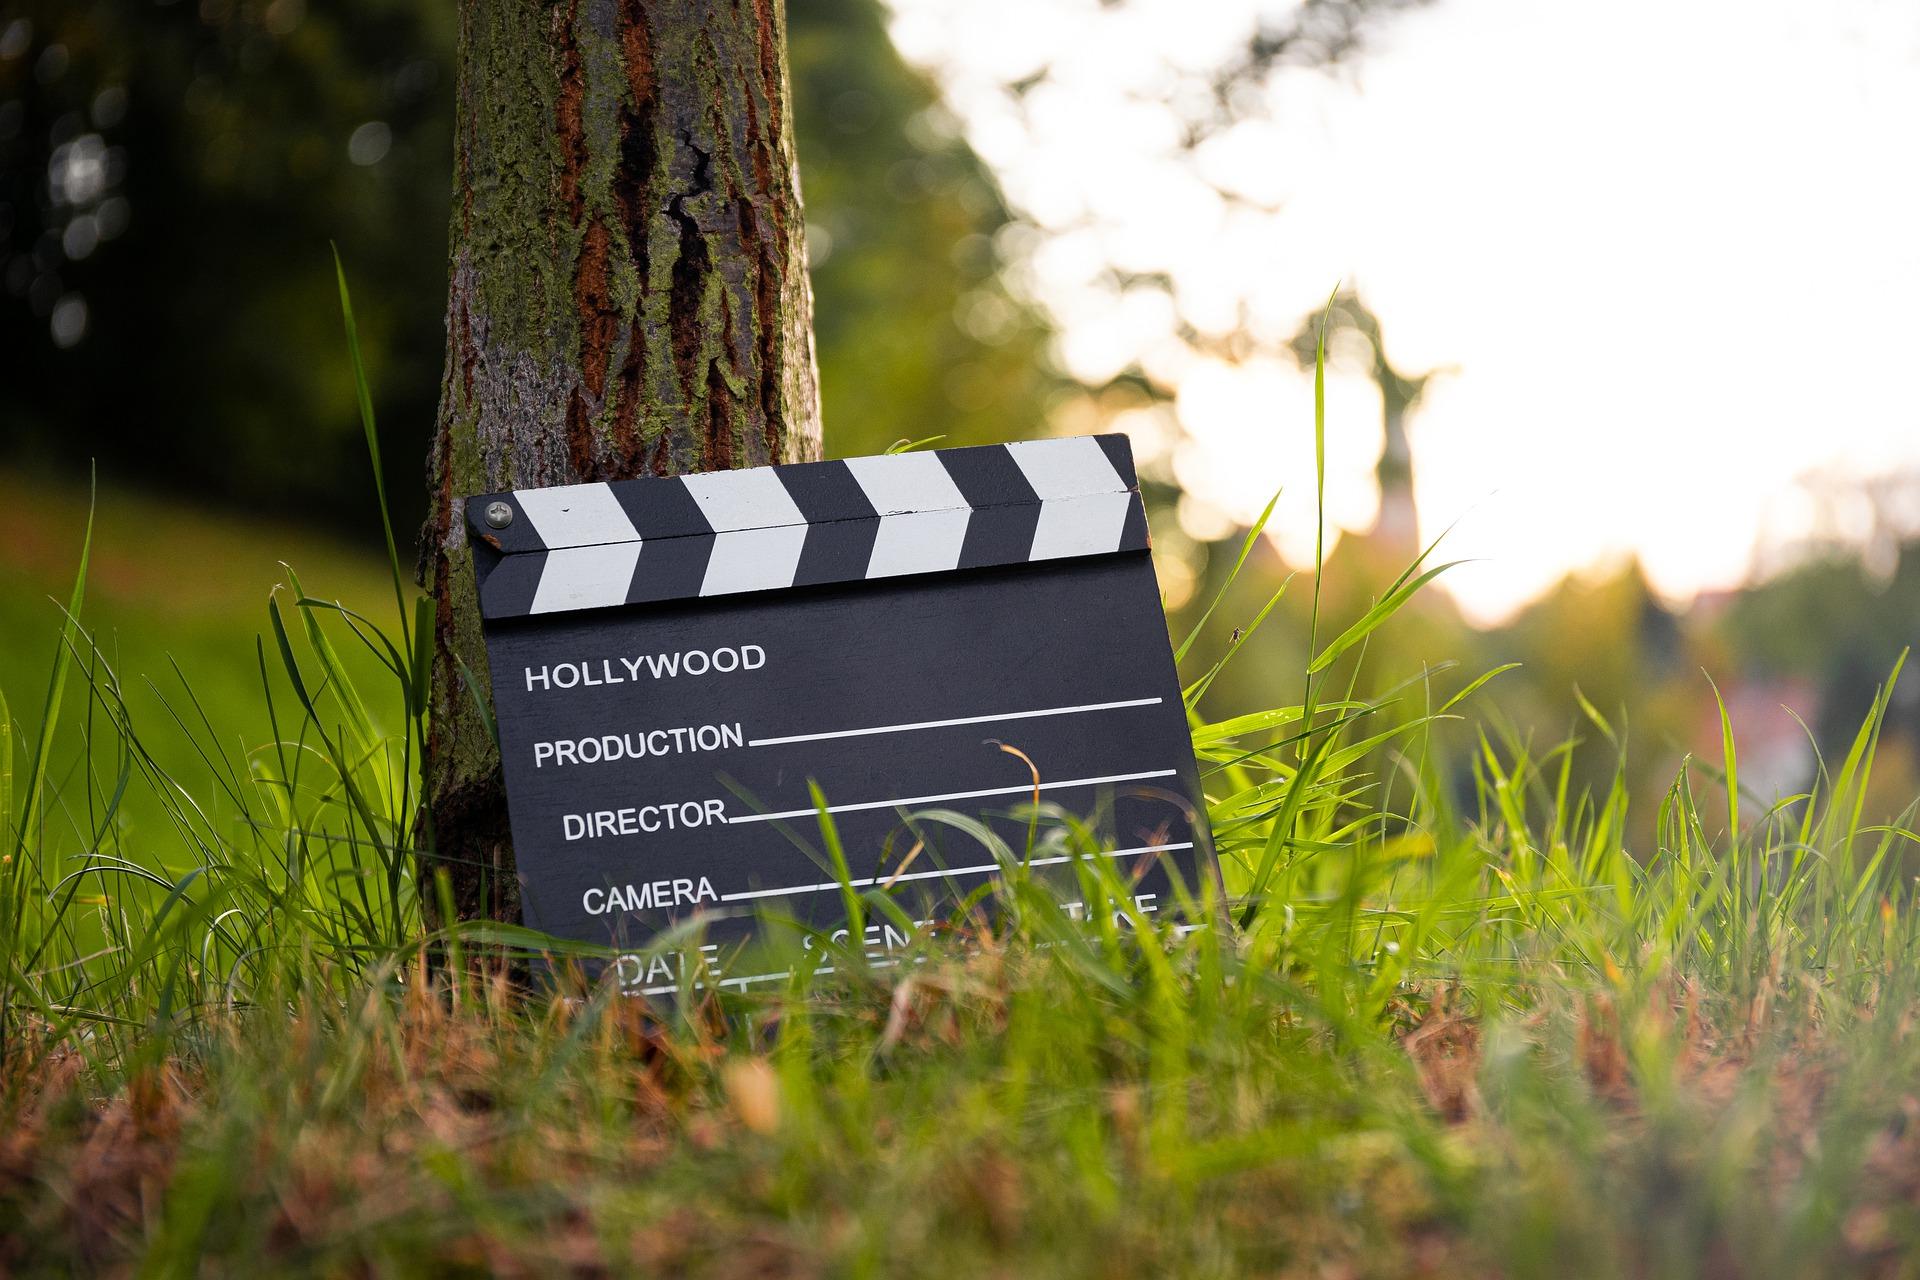 Filmklappe lehnt an einem Baum